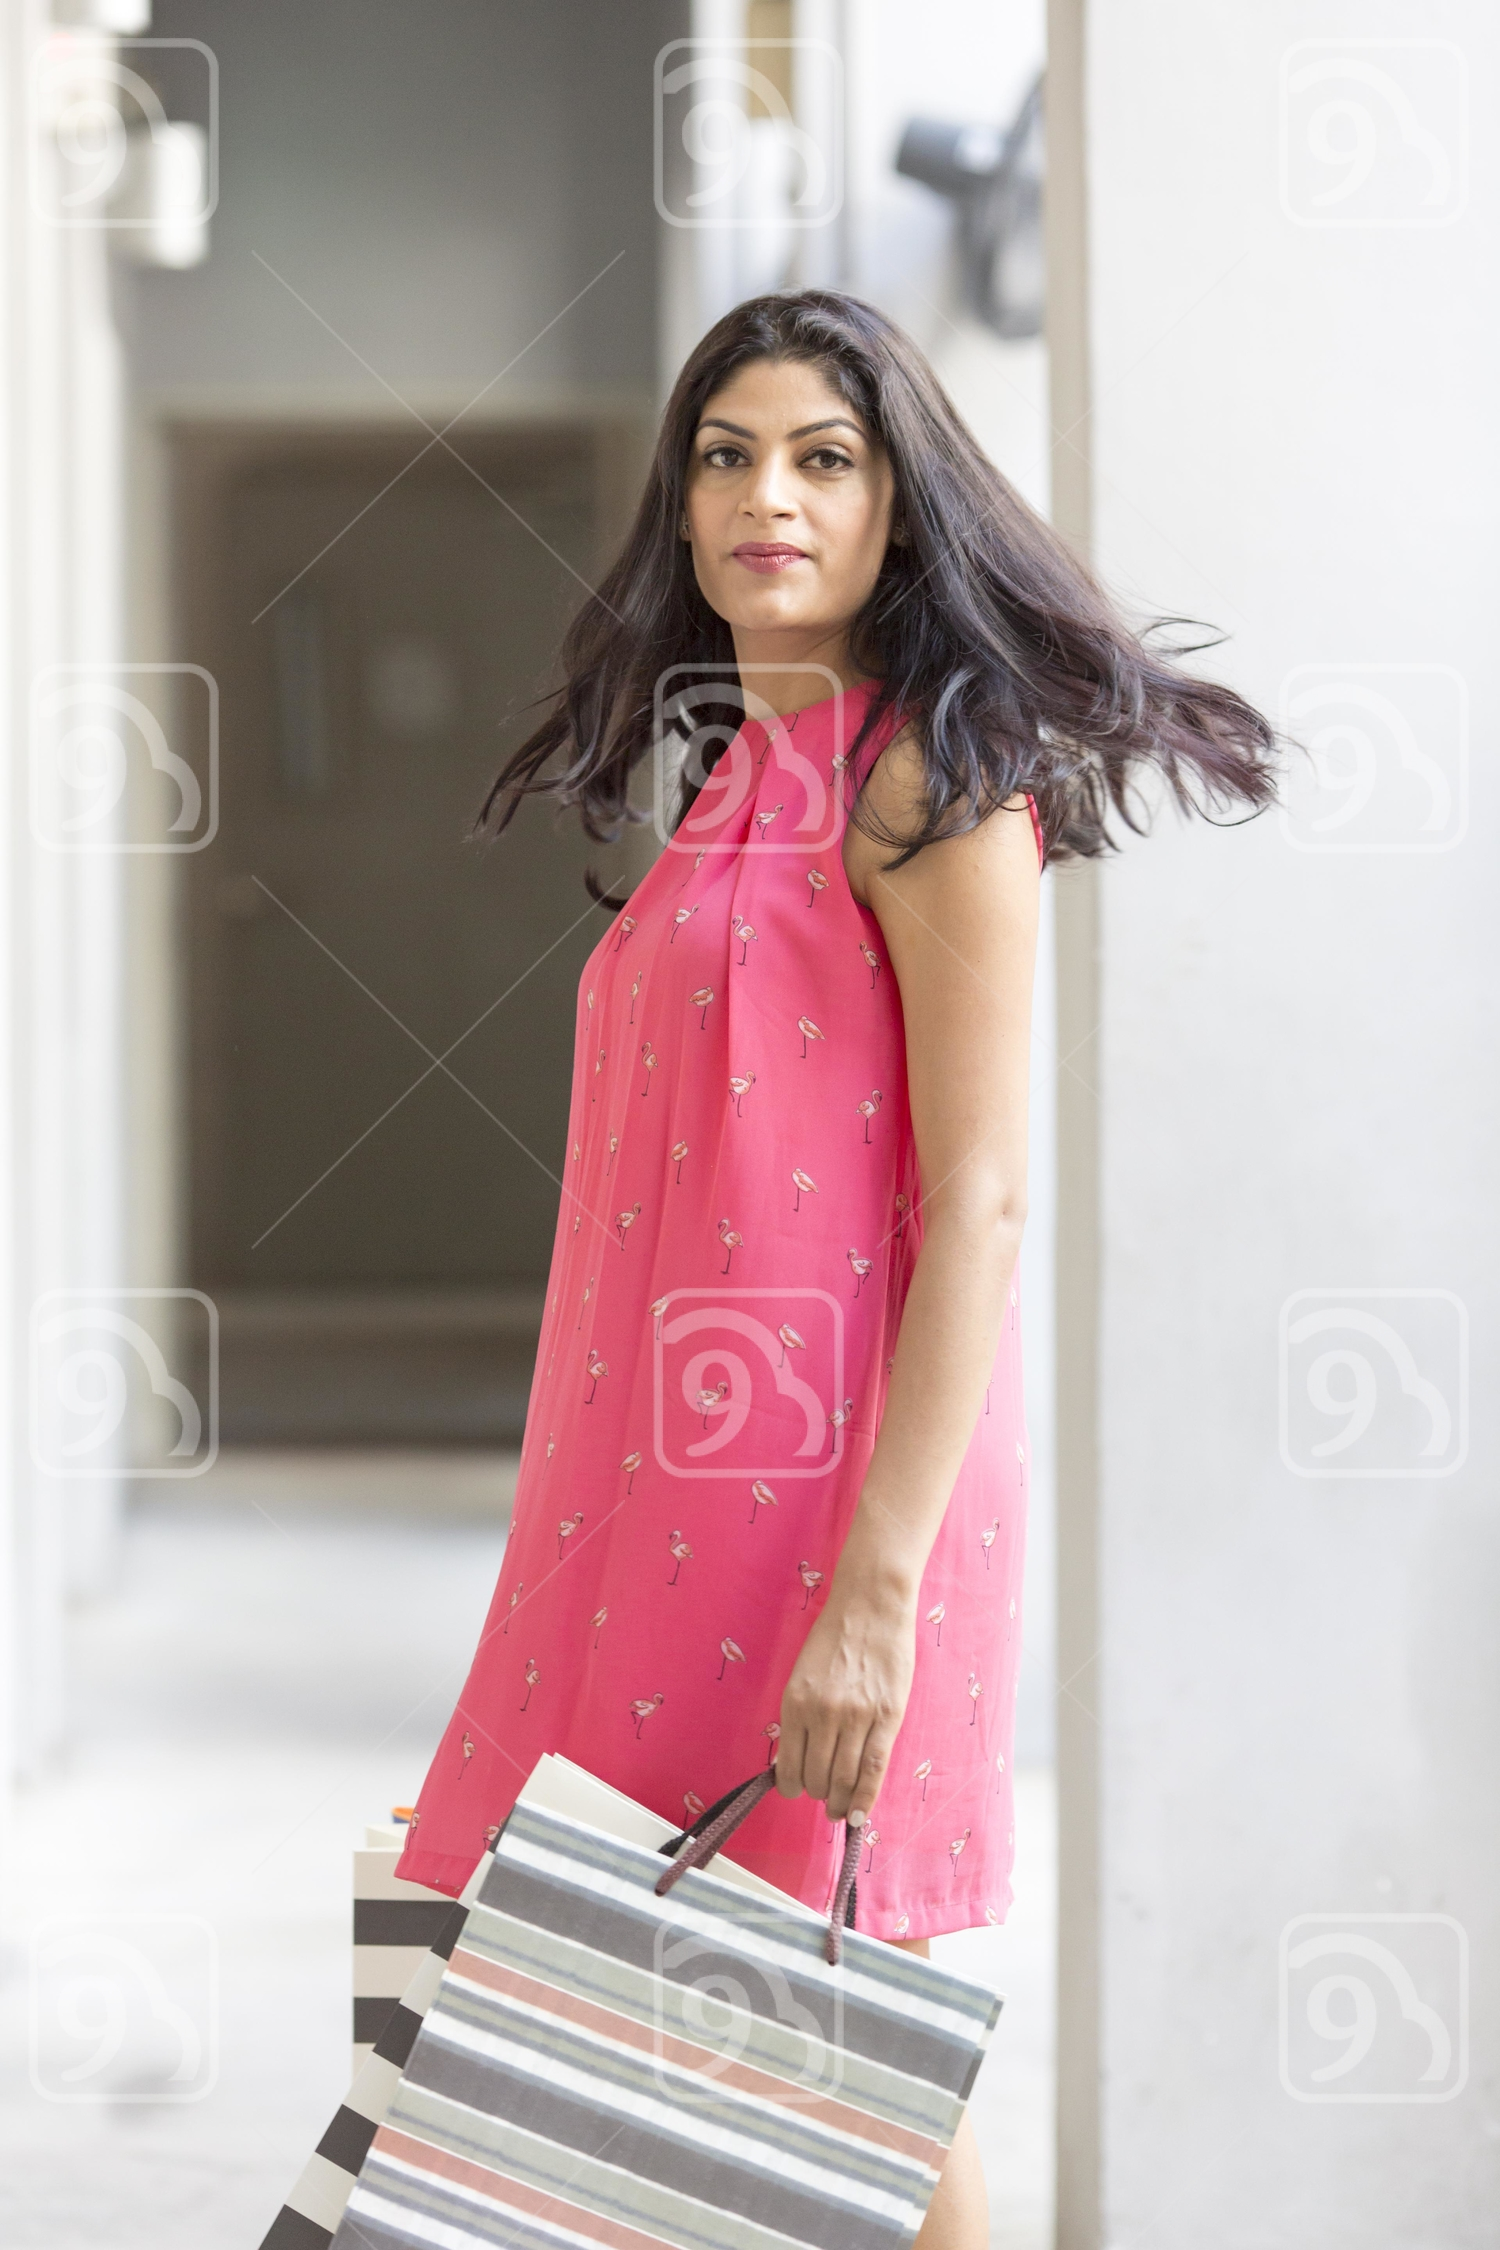 Pretty woman on shopping spree